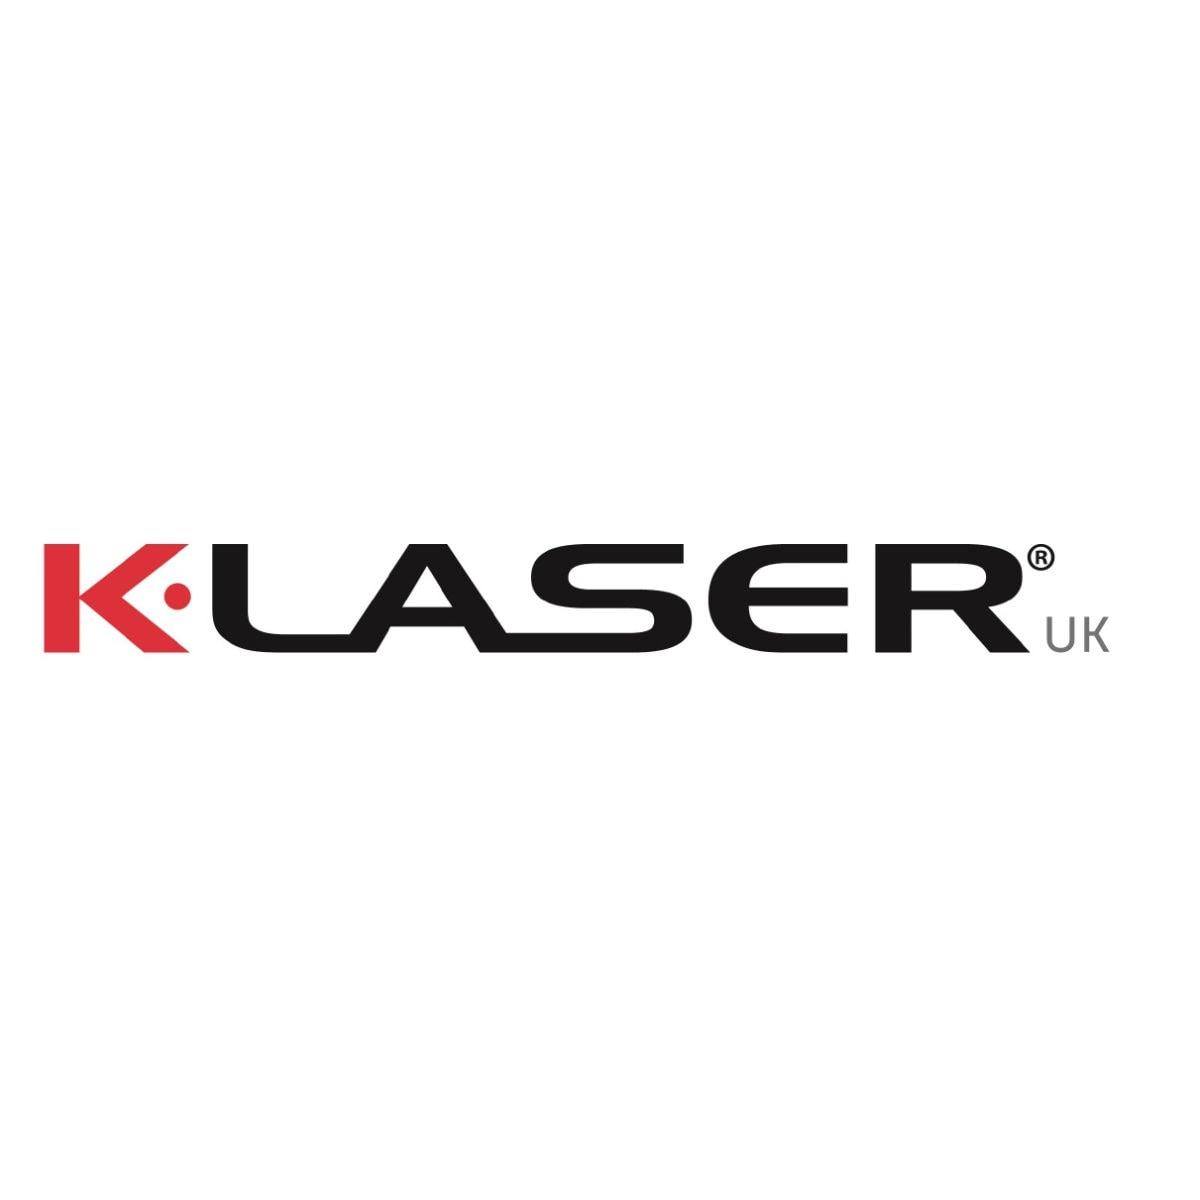 k laser uk logo sq